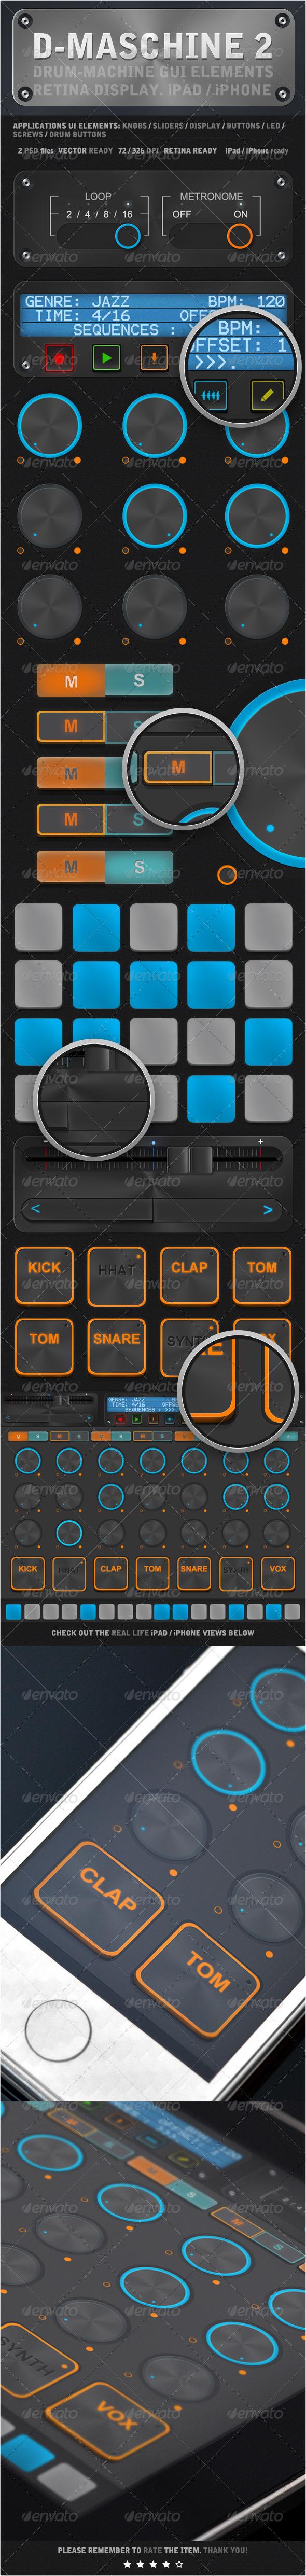 D-Maschine 2 iPad iPhone UI Elements